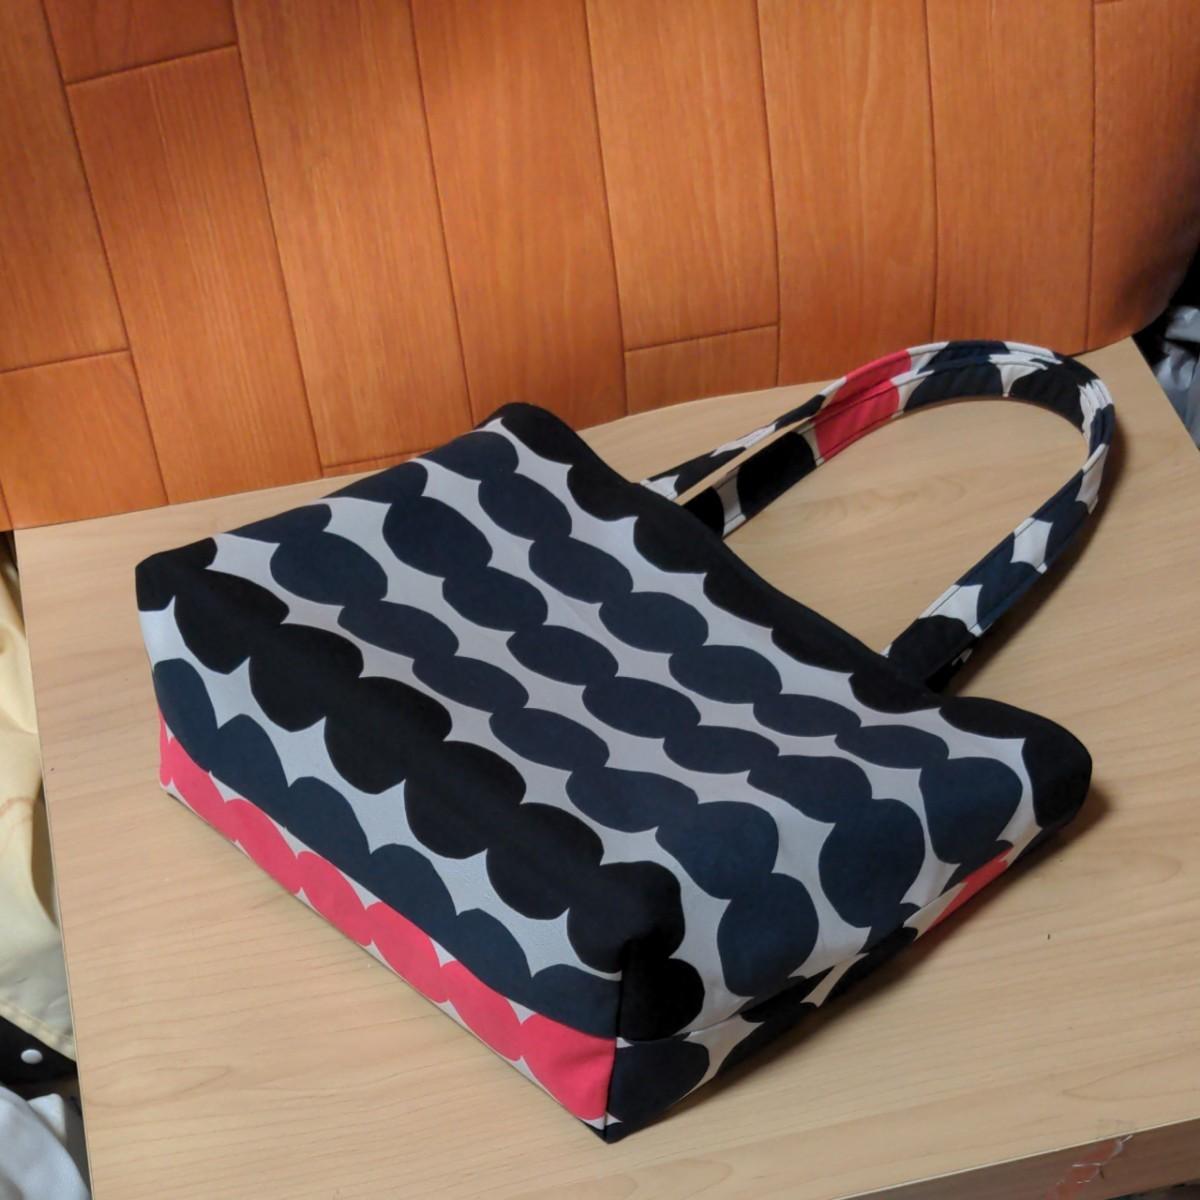 !!yu様専用!!マリメッコ トートバッグ22-23土日限定20%引き handmade